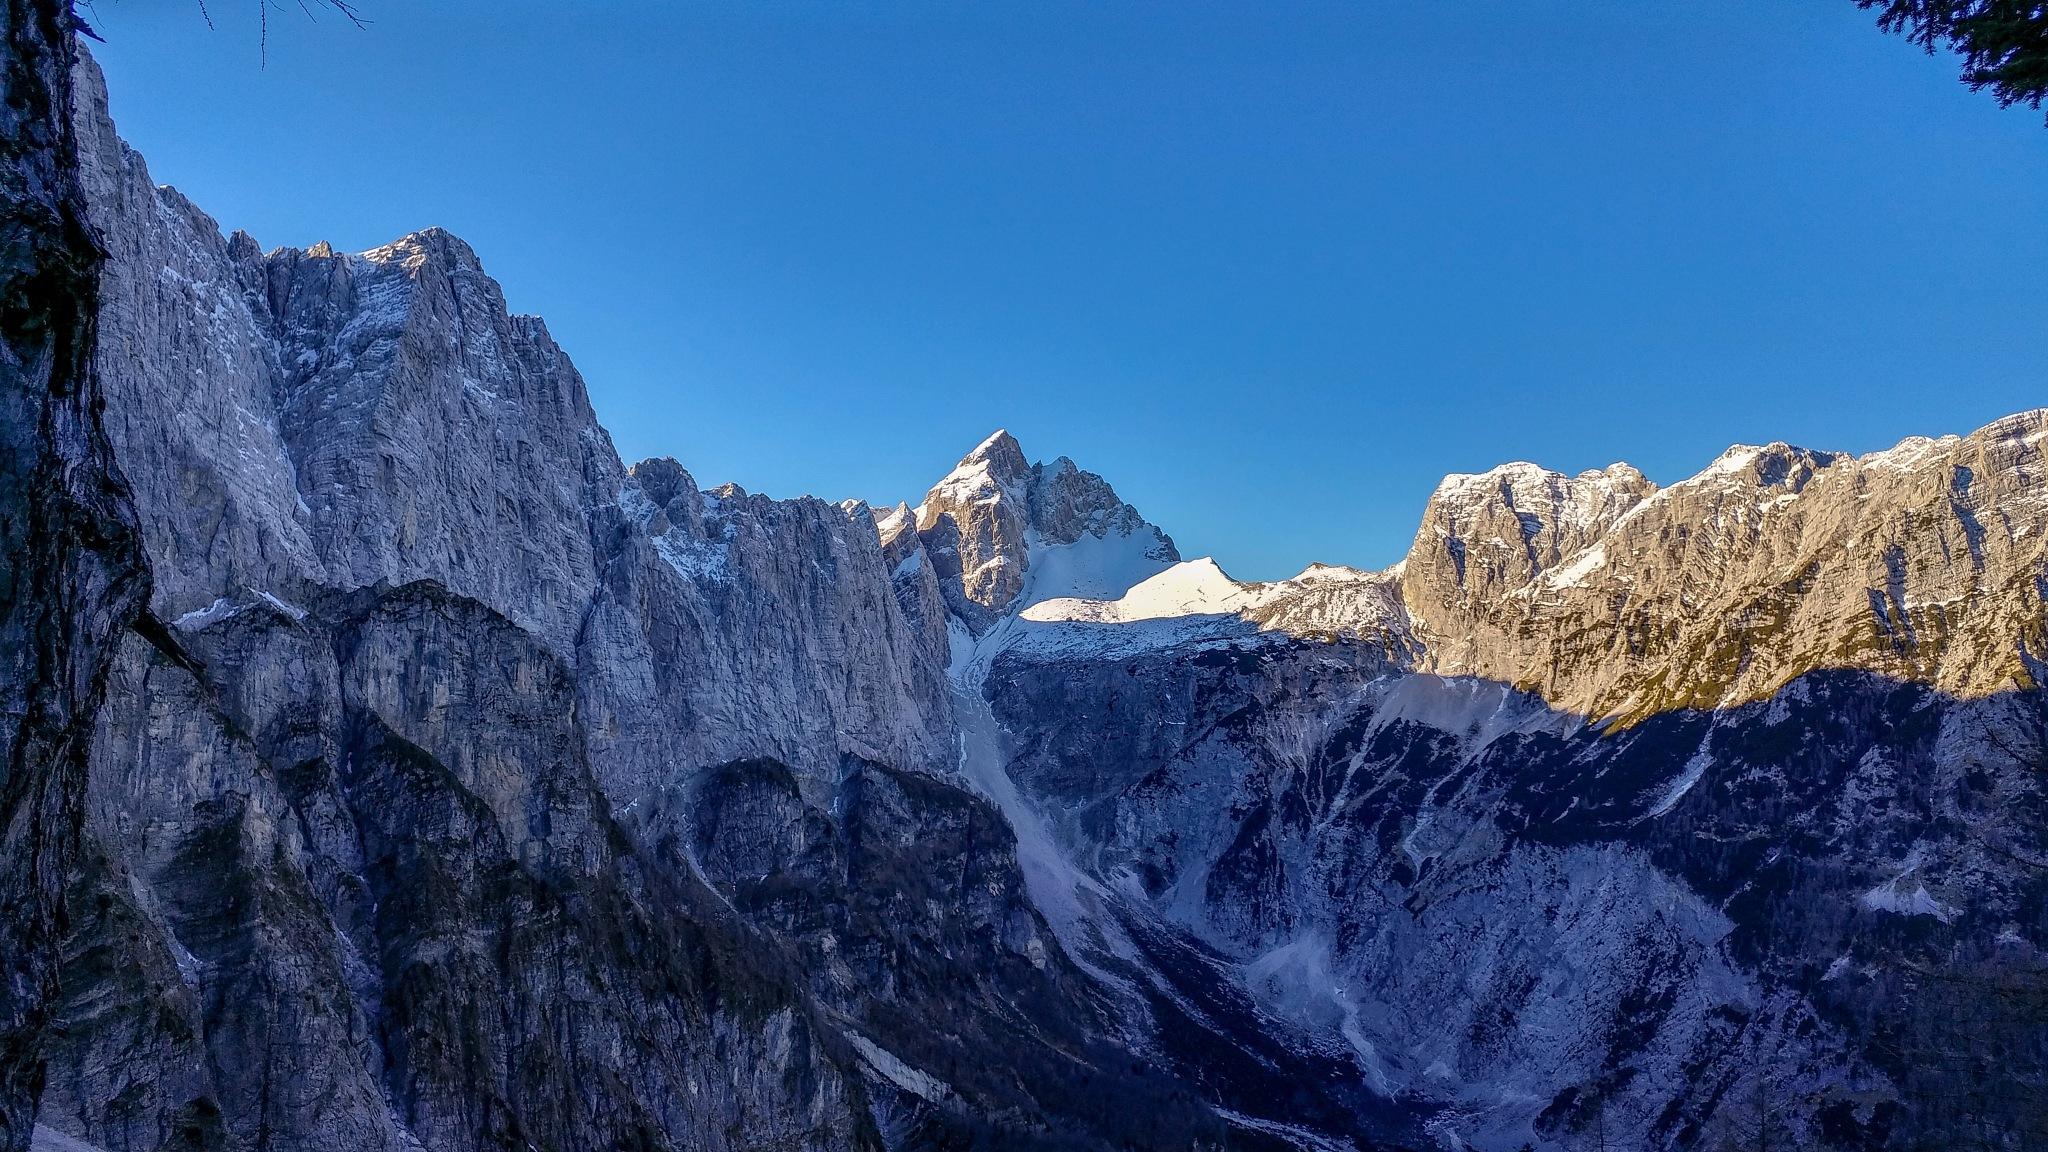 Julian Alps by Alexander